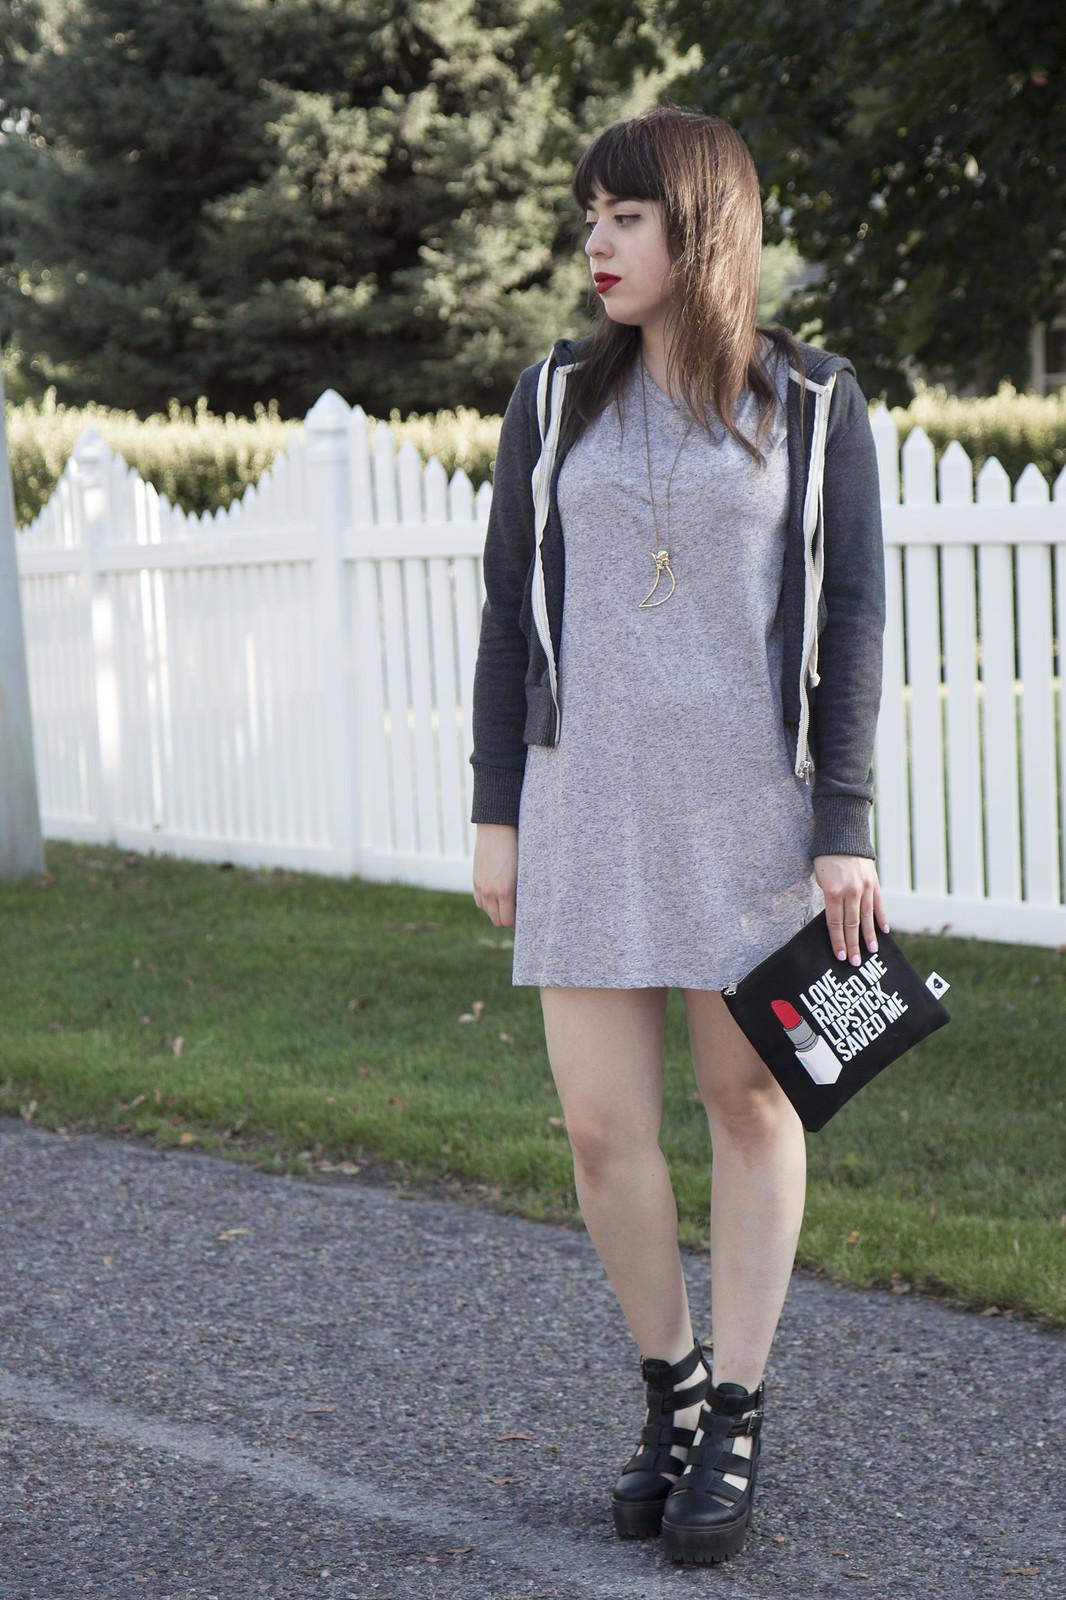 h&m dress, alternative apparel hoodie, topshop arcade boots